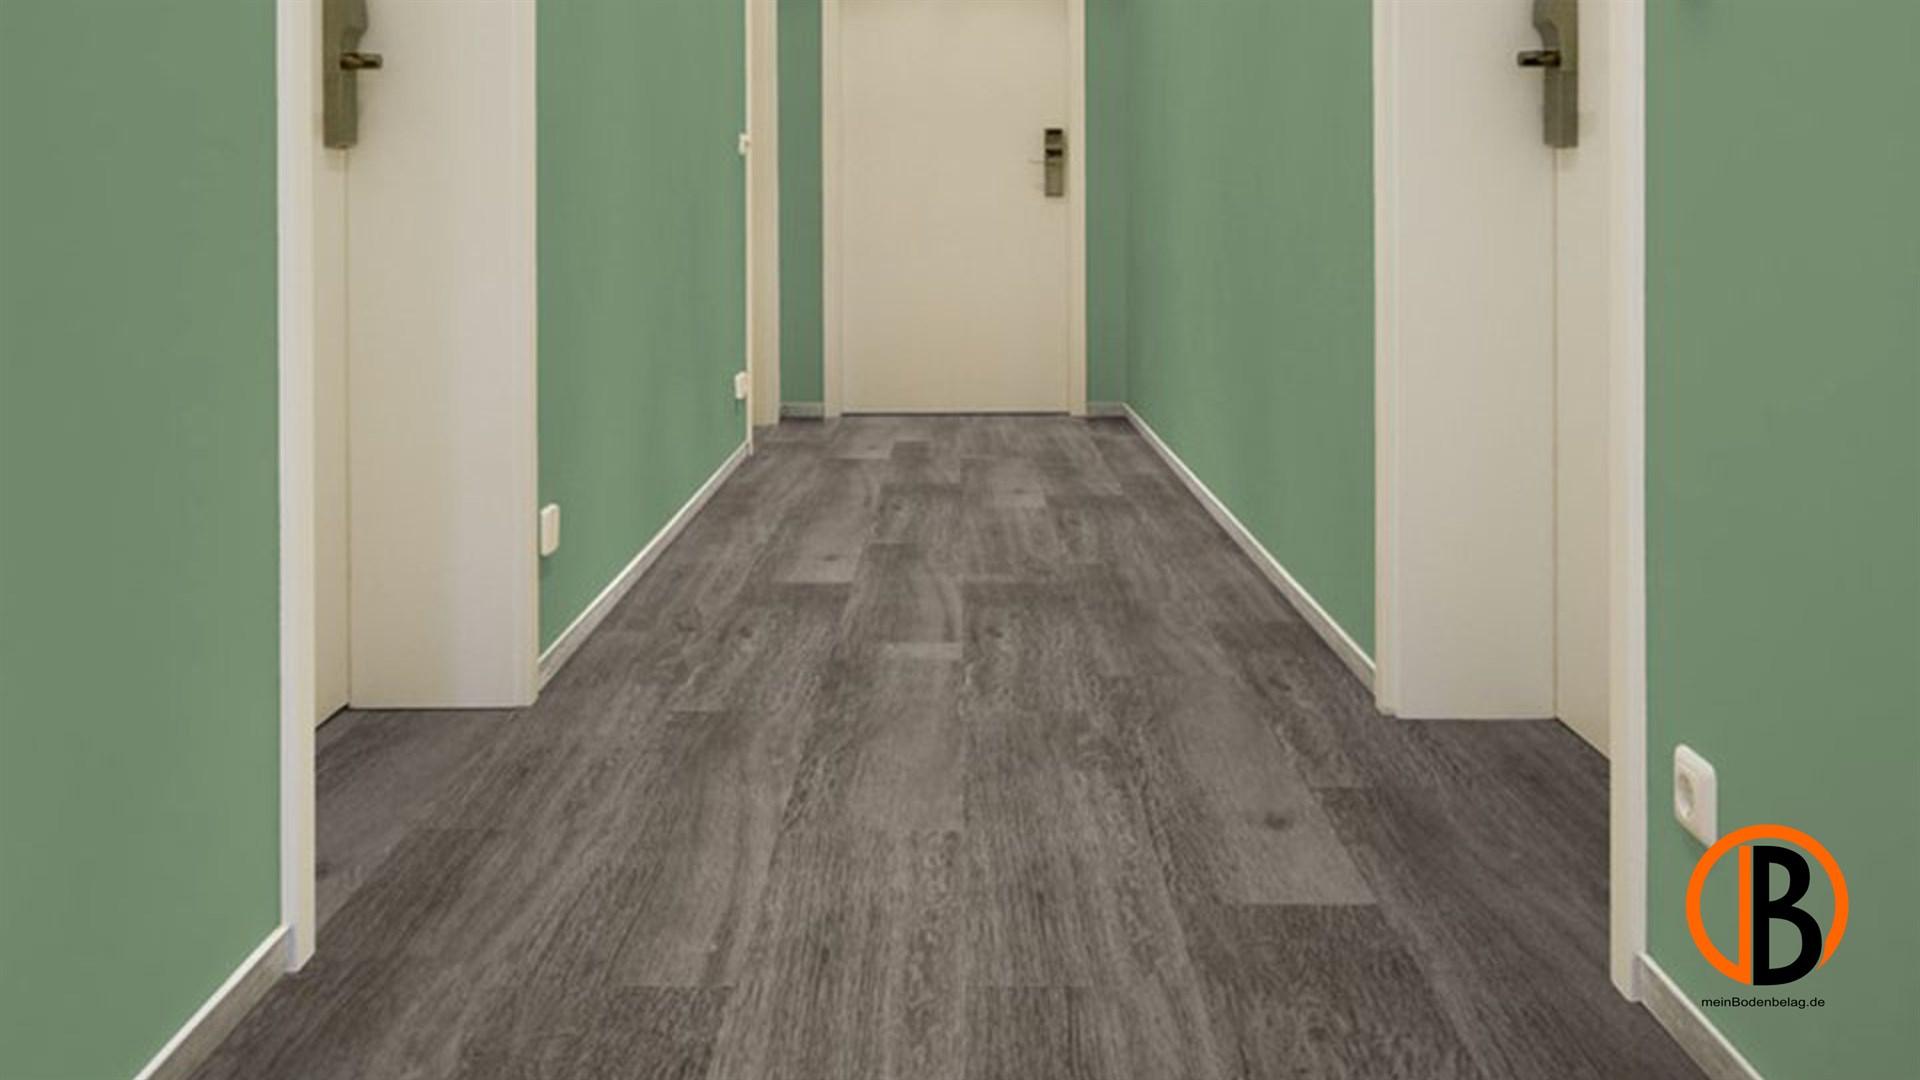 Project floors vinyl floors home 30 pw 3611 30 - Linoleum holzdekor ...